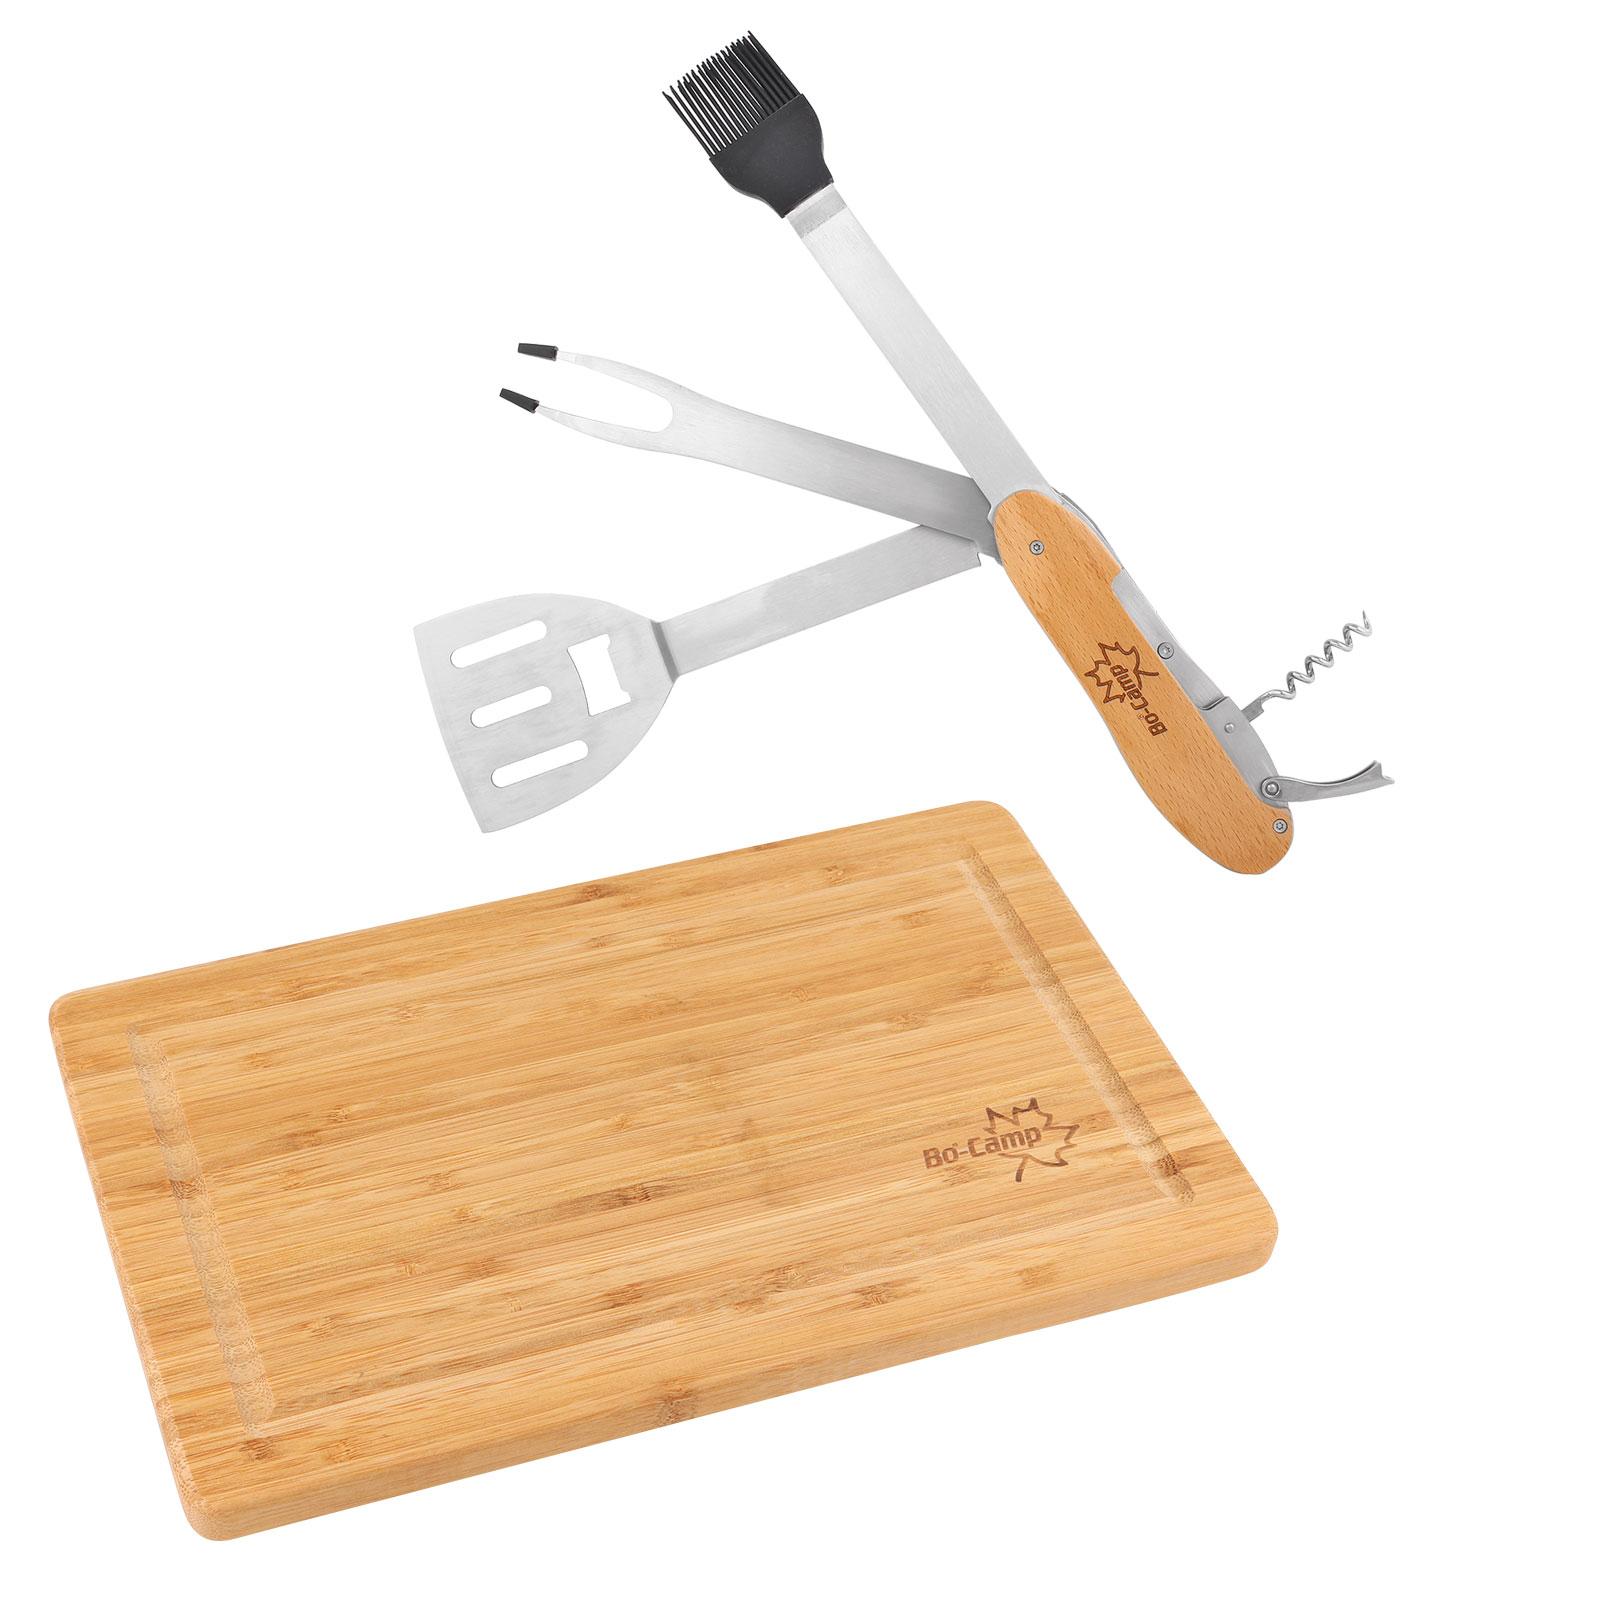 Bambus Schneidebrett inkl. Grillwerkzeug Bo-Camp Special-Set